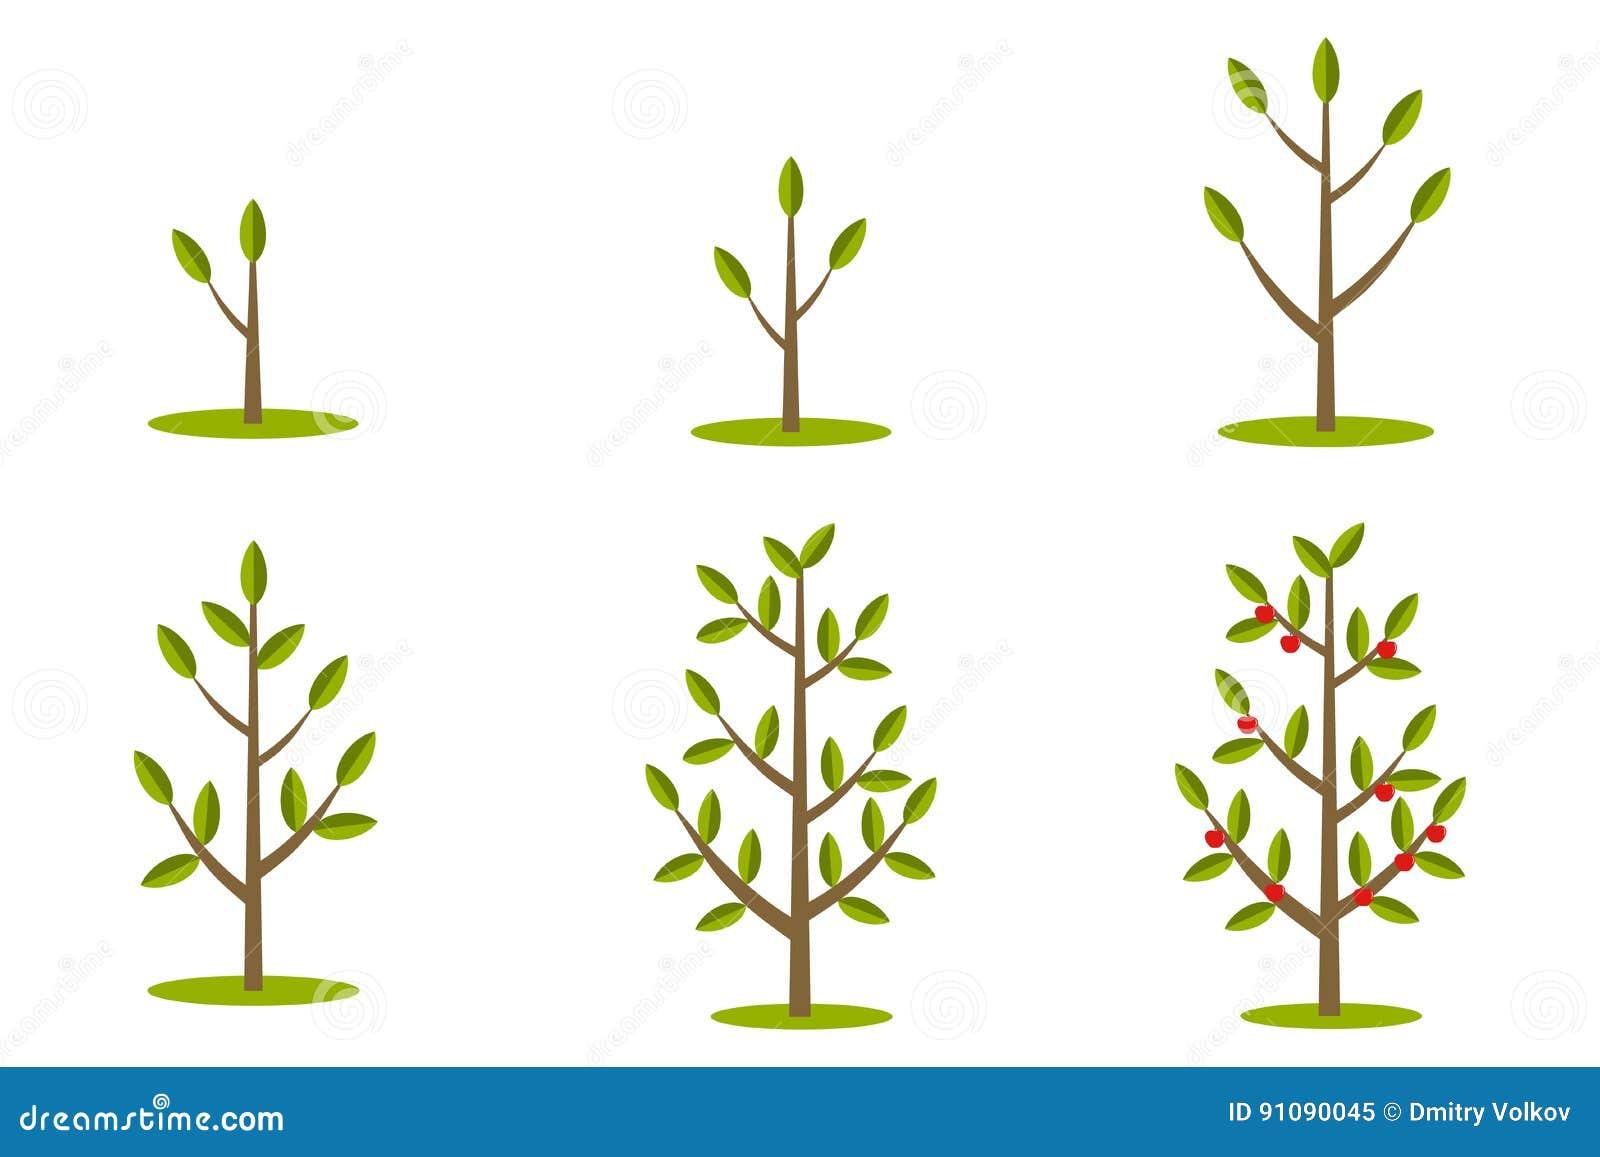 phases de croissance d 39 arbre illustration stock illustration du cycle plat 91090045. Black Bedroom Furniture Sets. Home Design Ideas